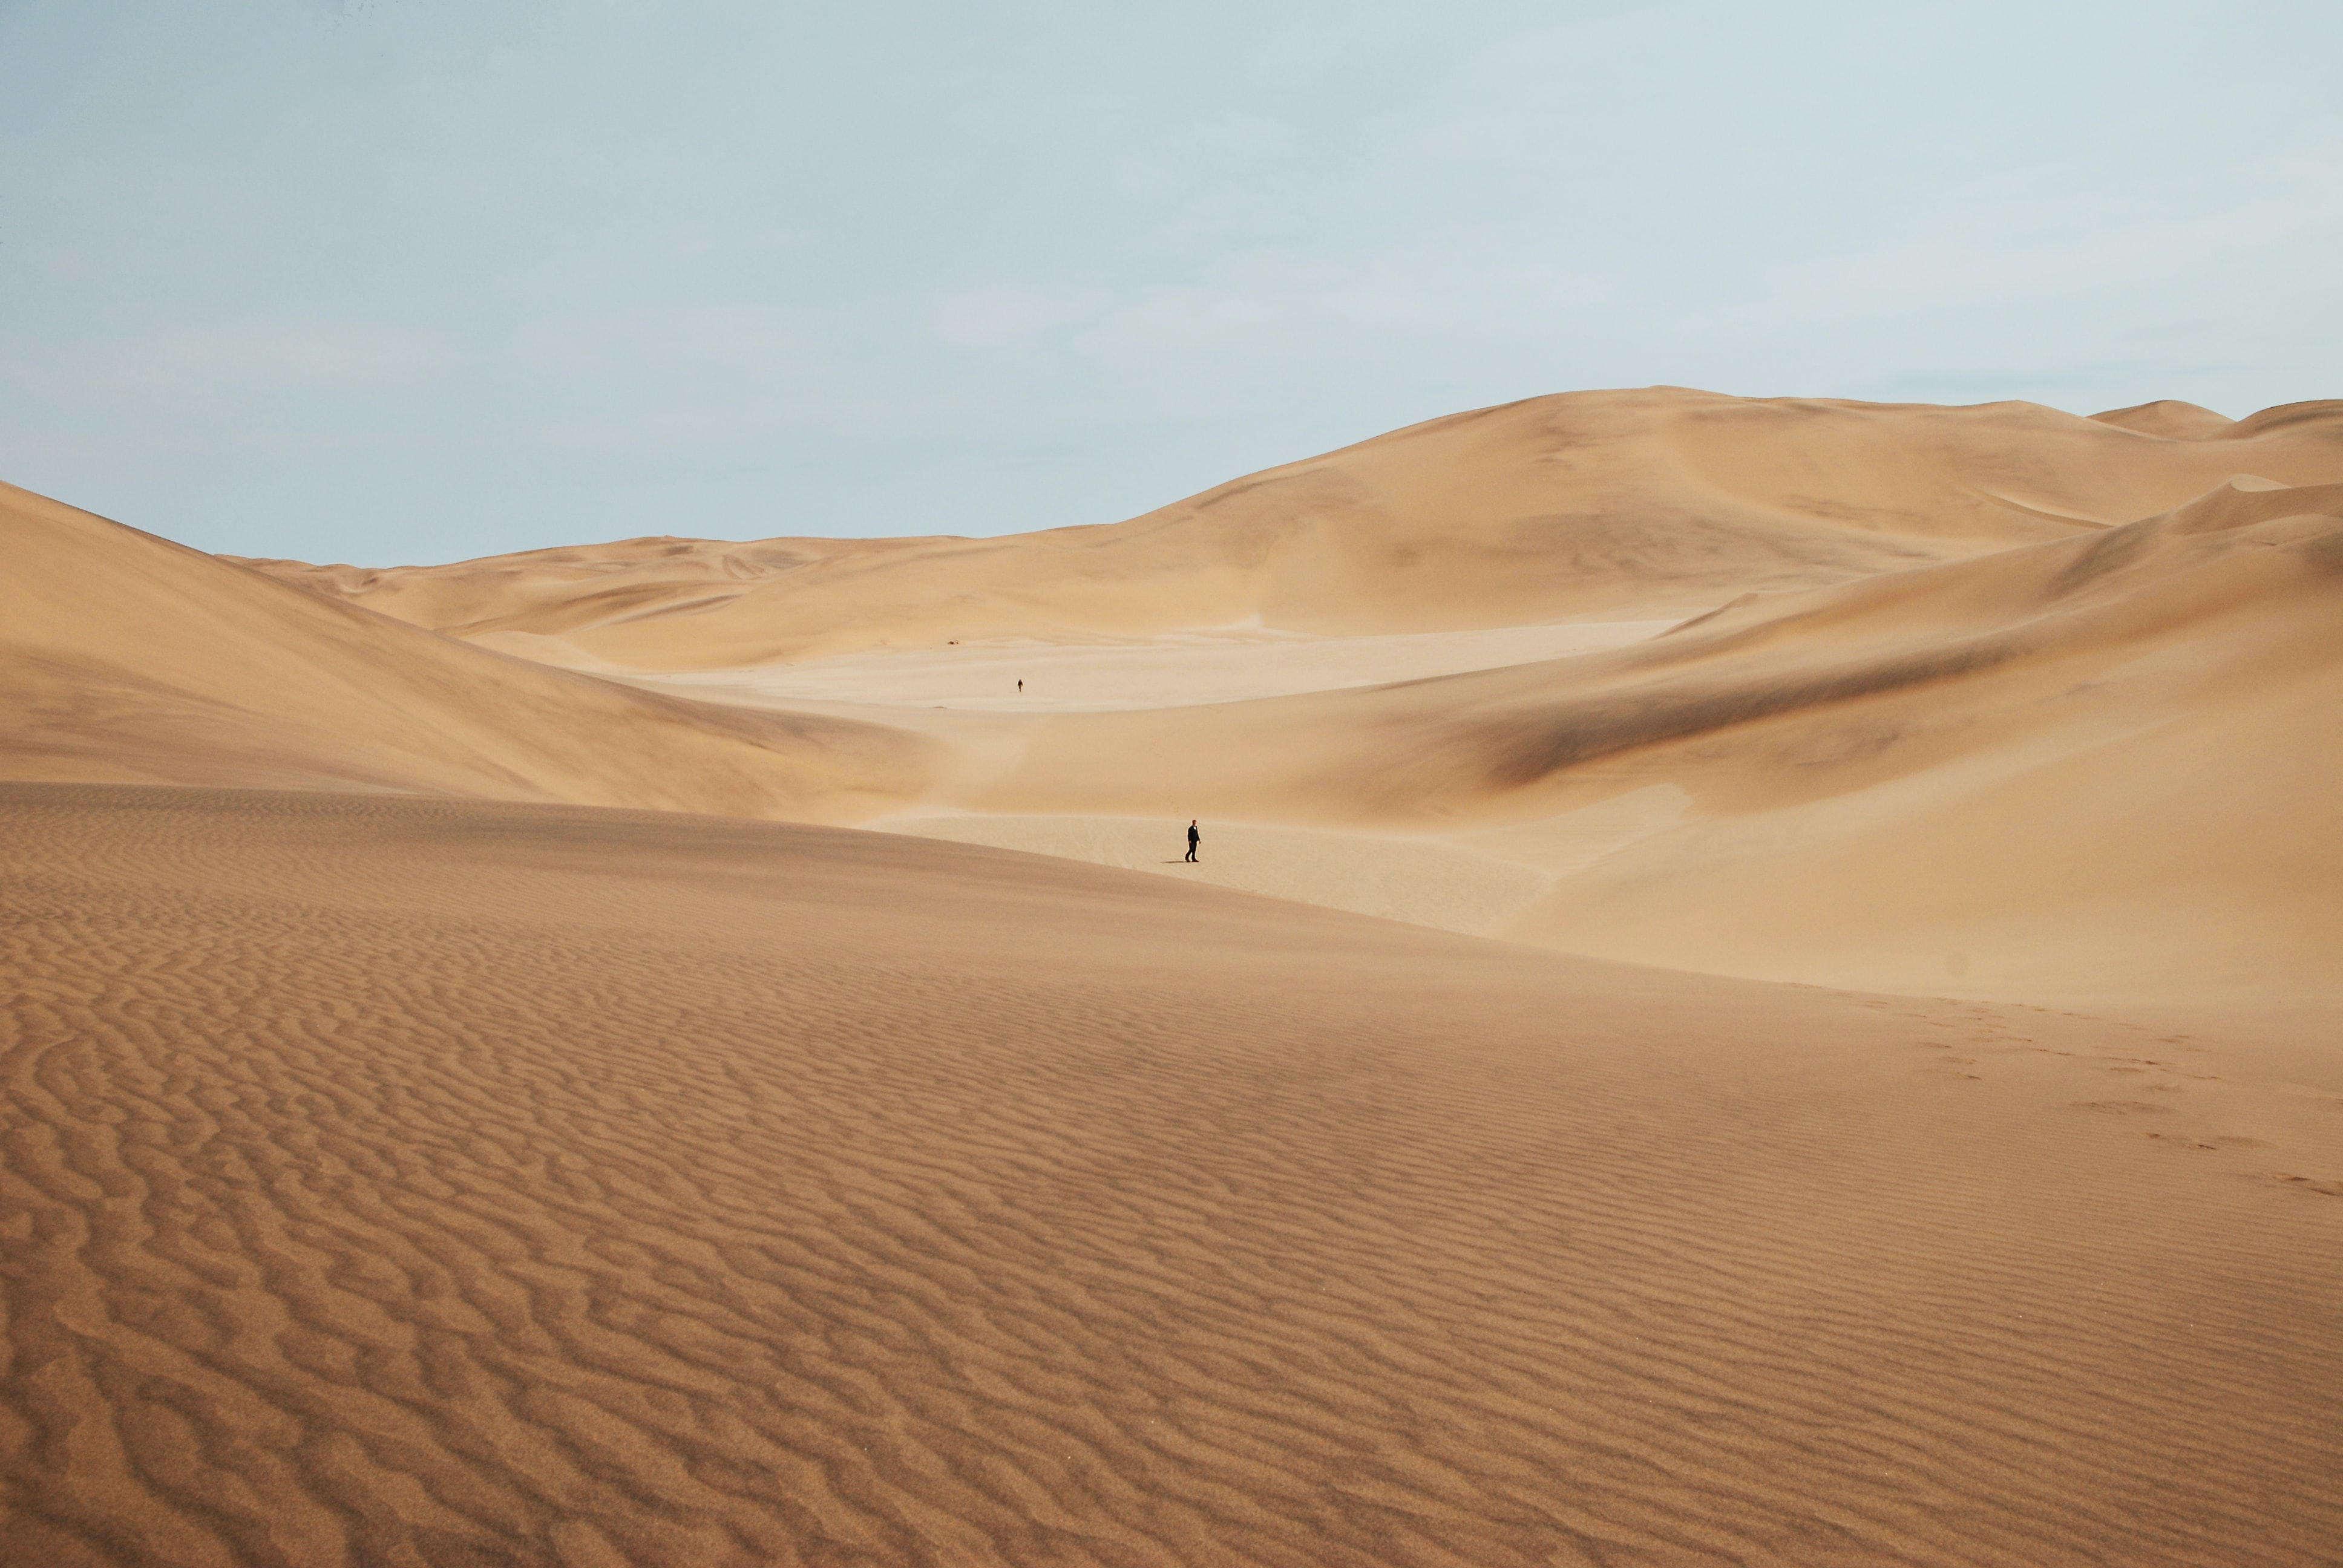 person on desert